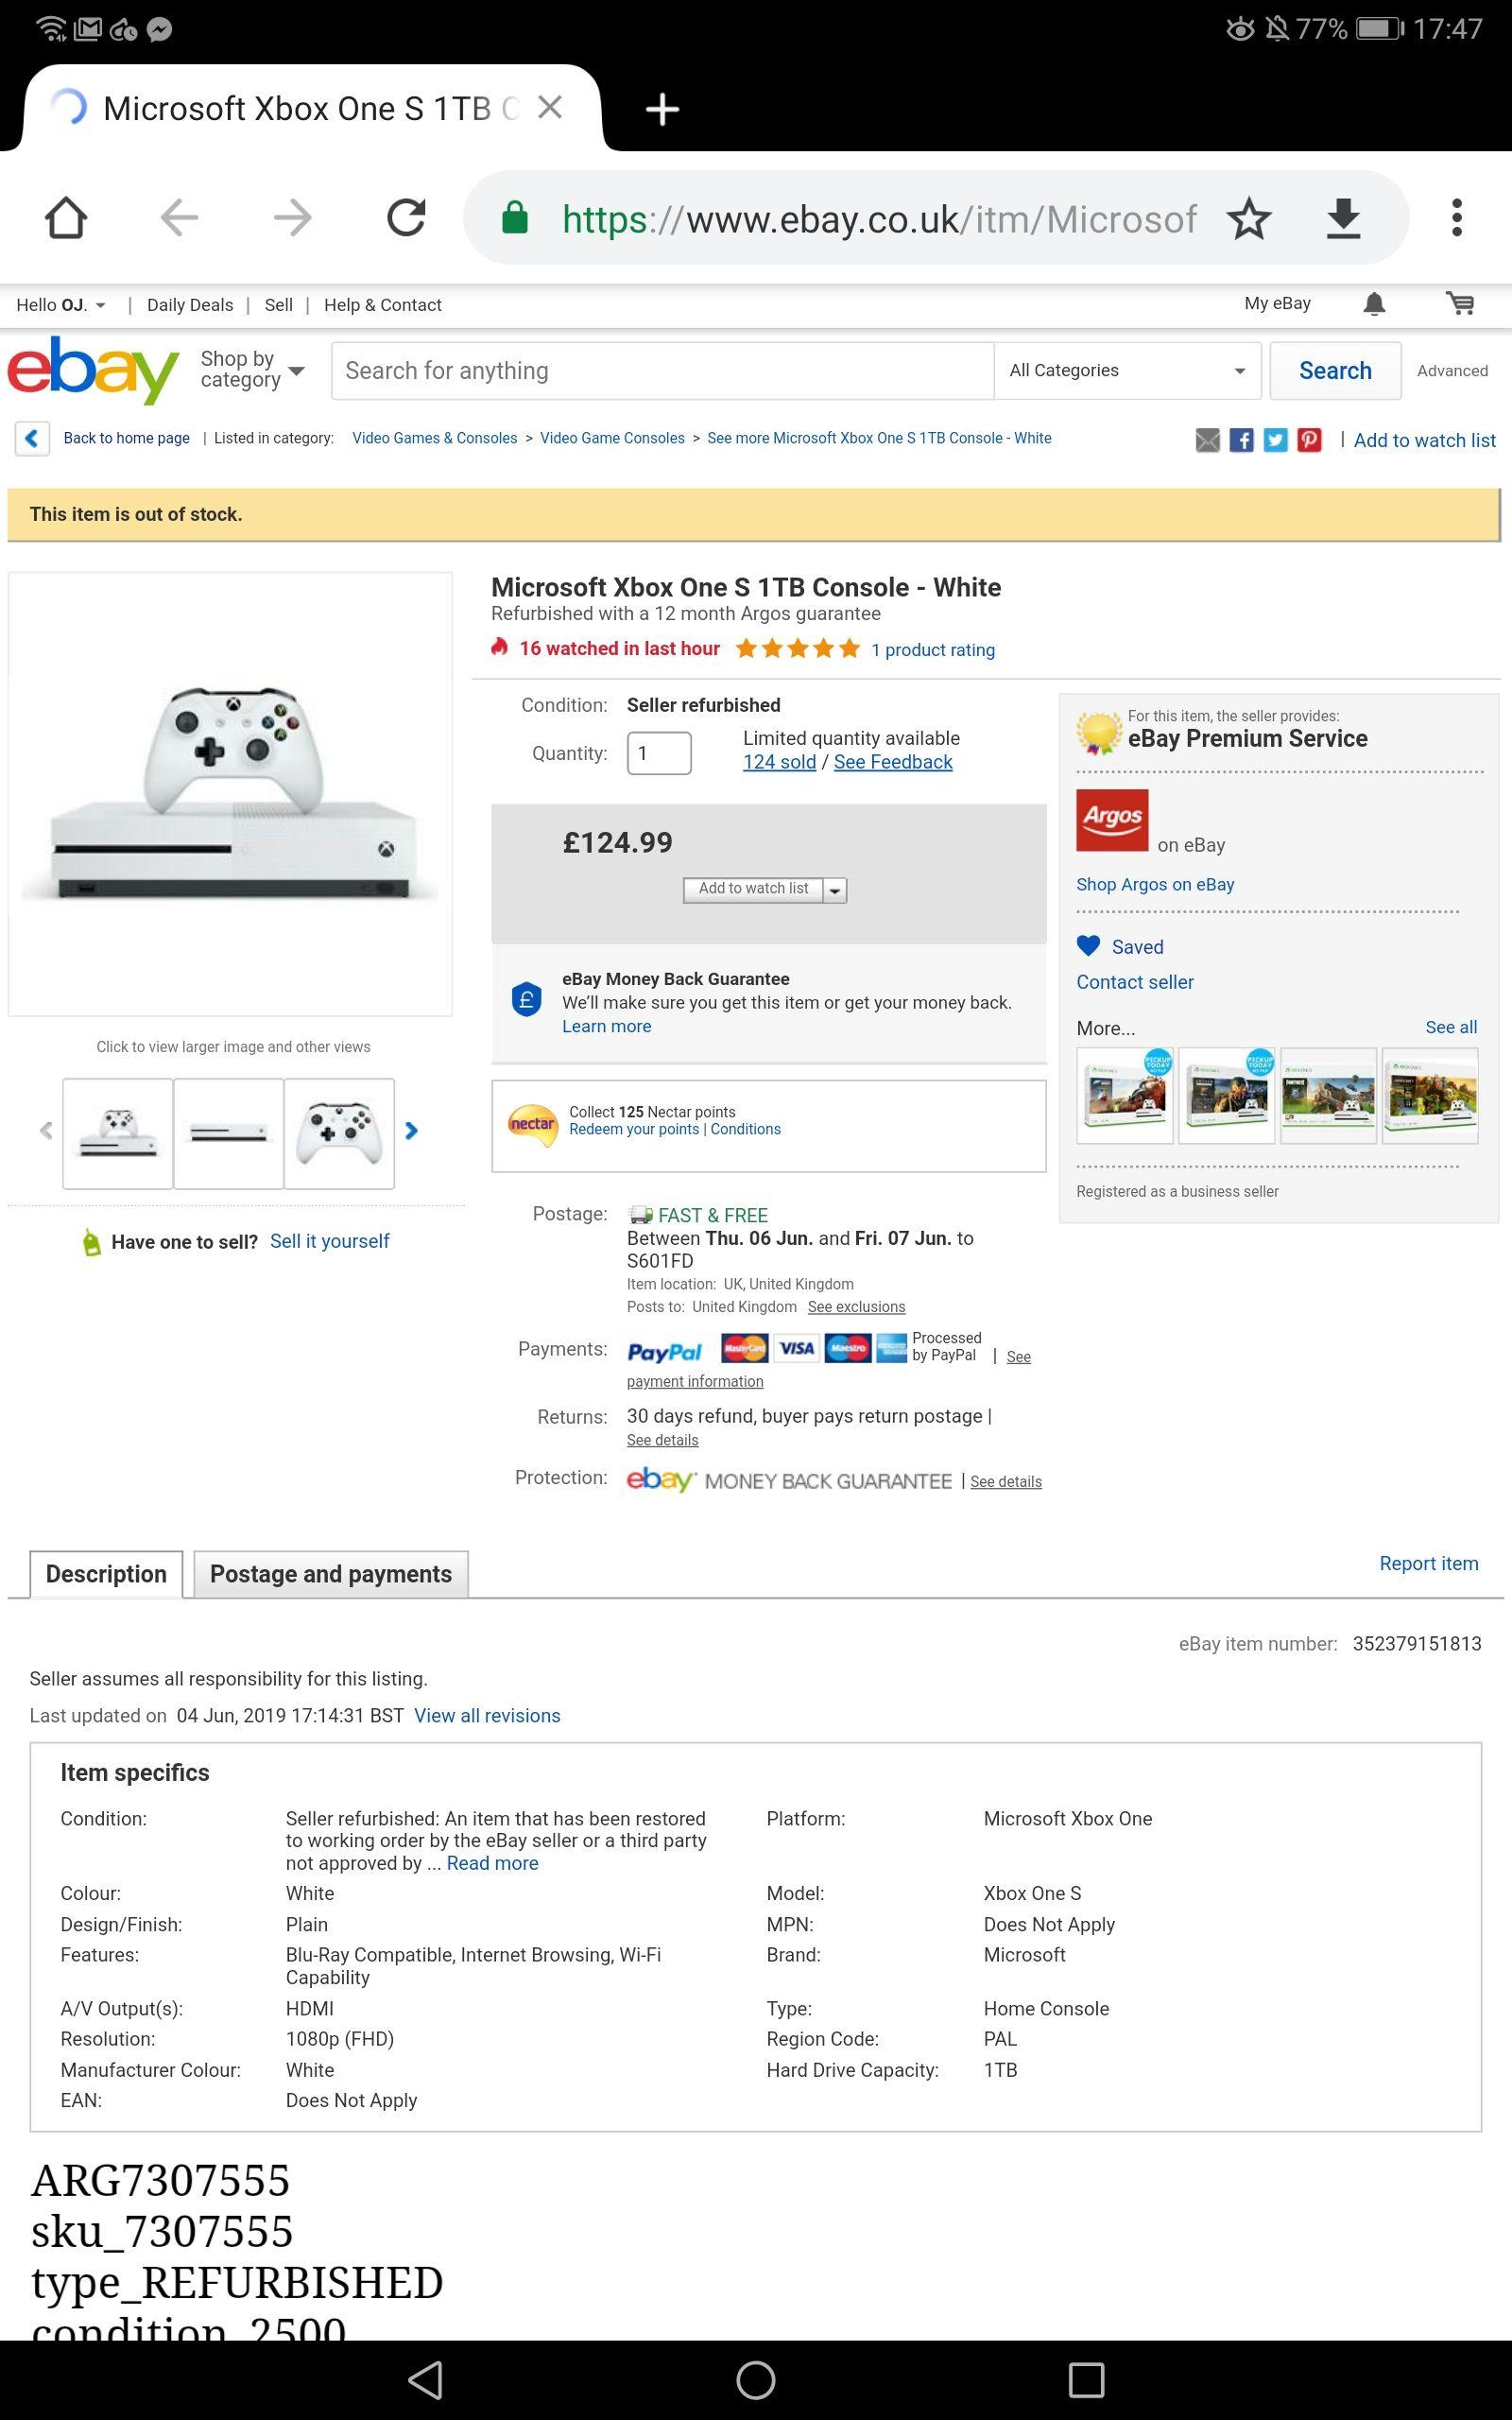 Refurb (12 months warranty) Microsoft Xbox One S 1TB Console